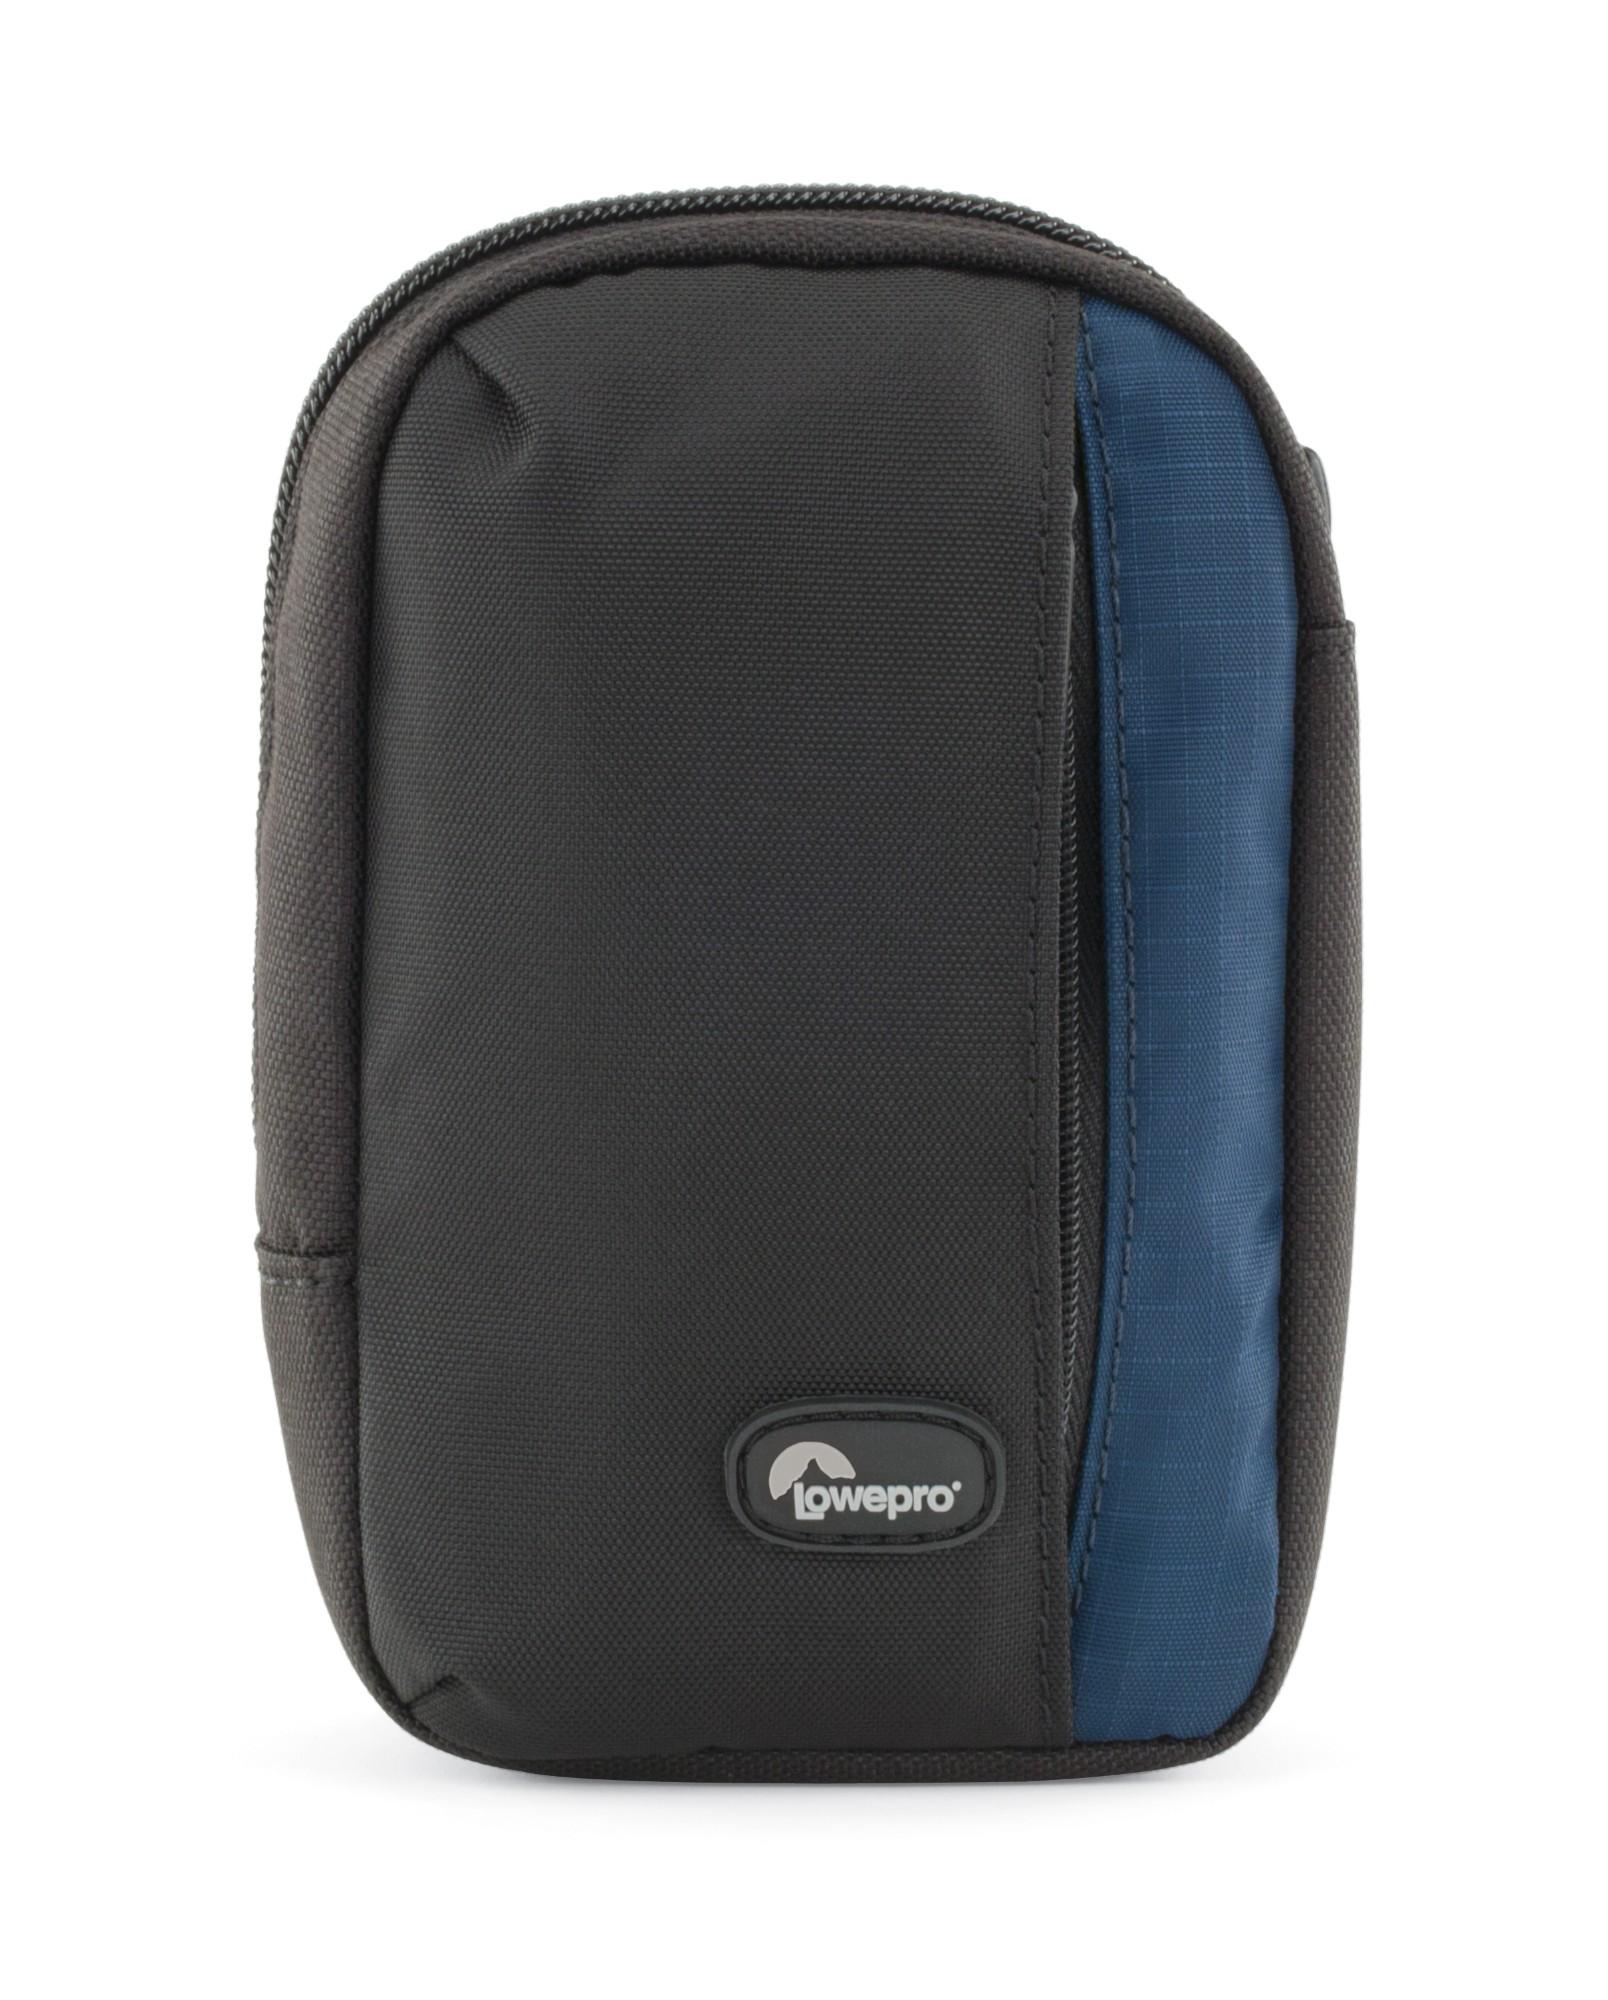 Lowepro Newport 30 - Black/Galaxy Blue